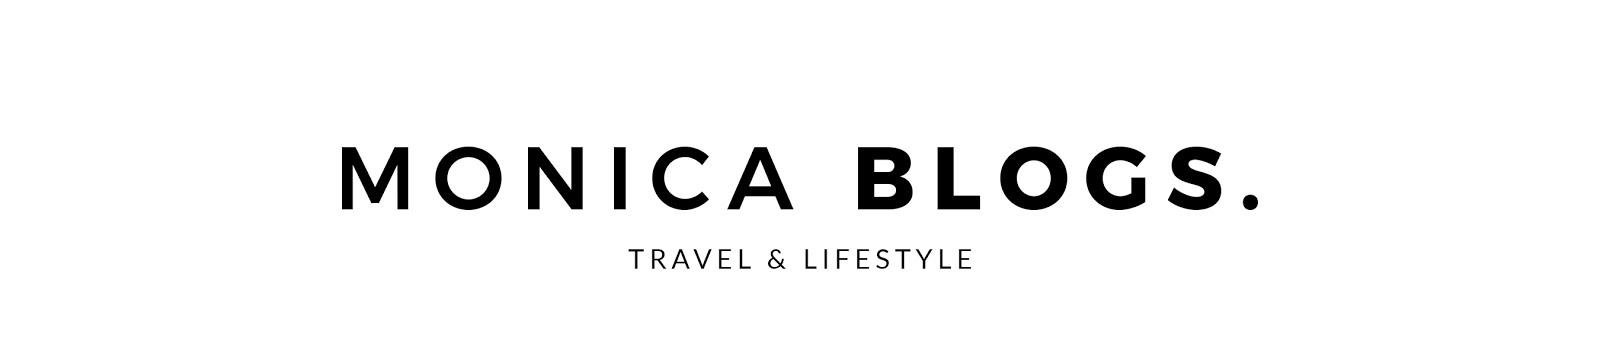 Monica Wilson | Travel & Lifestyle